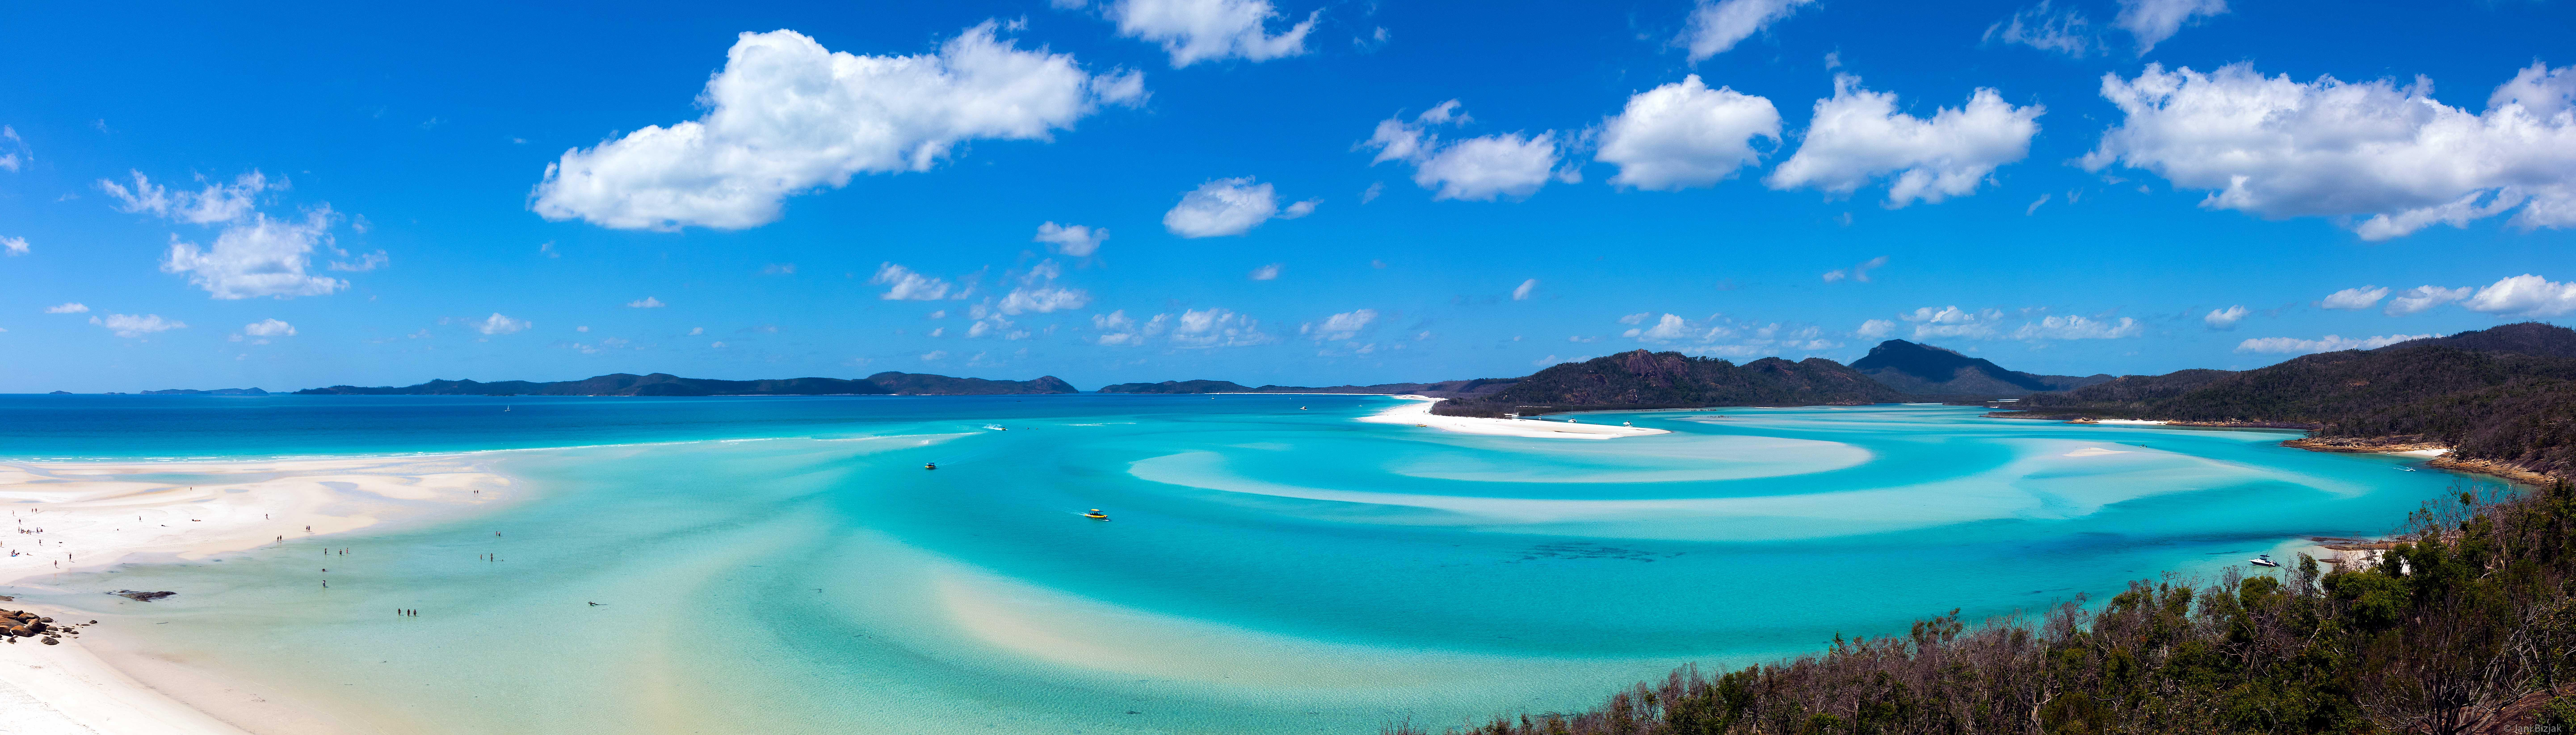 Whitsundays (Panorama)